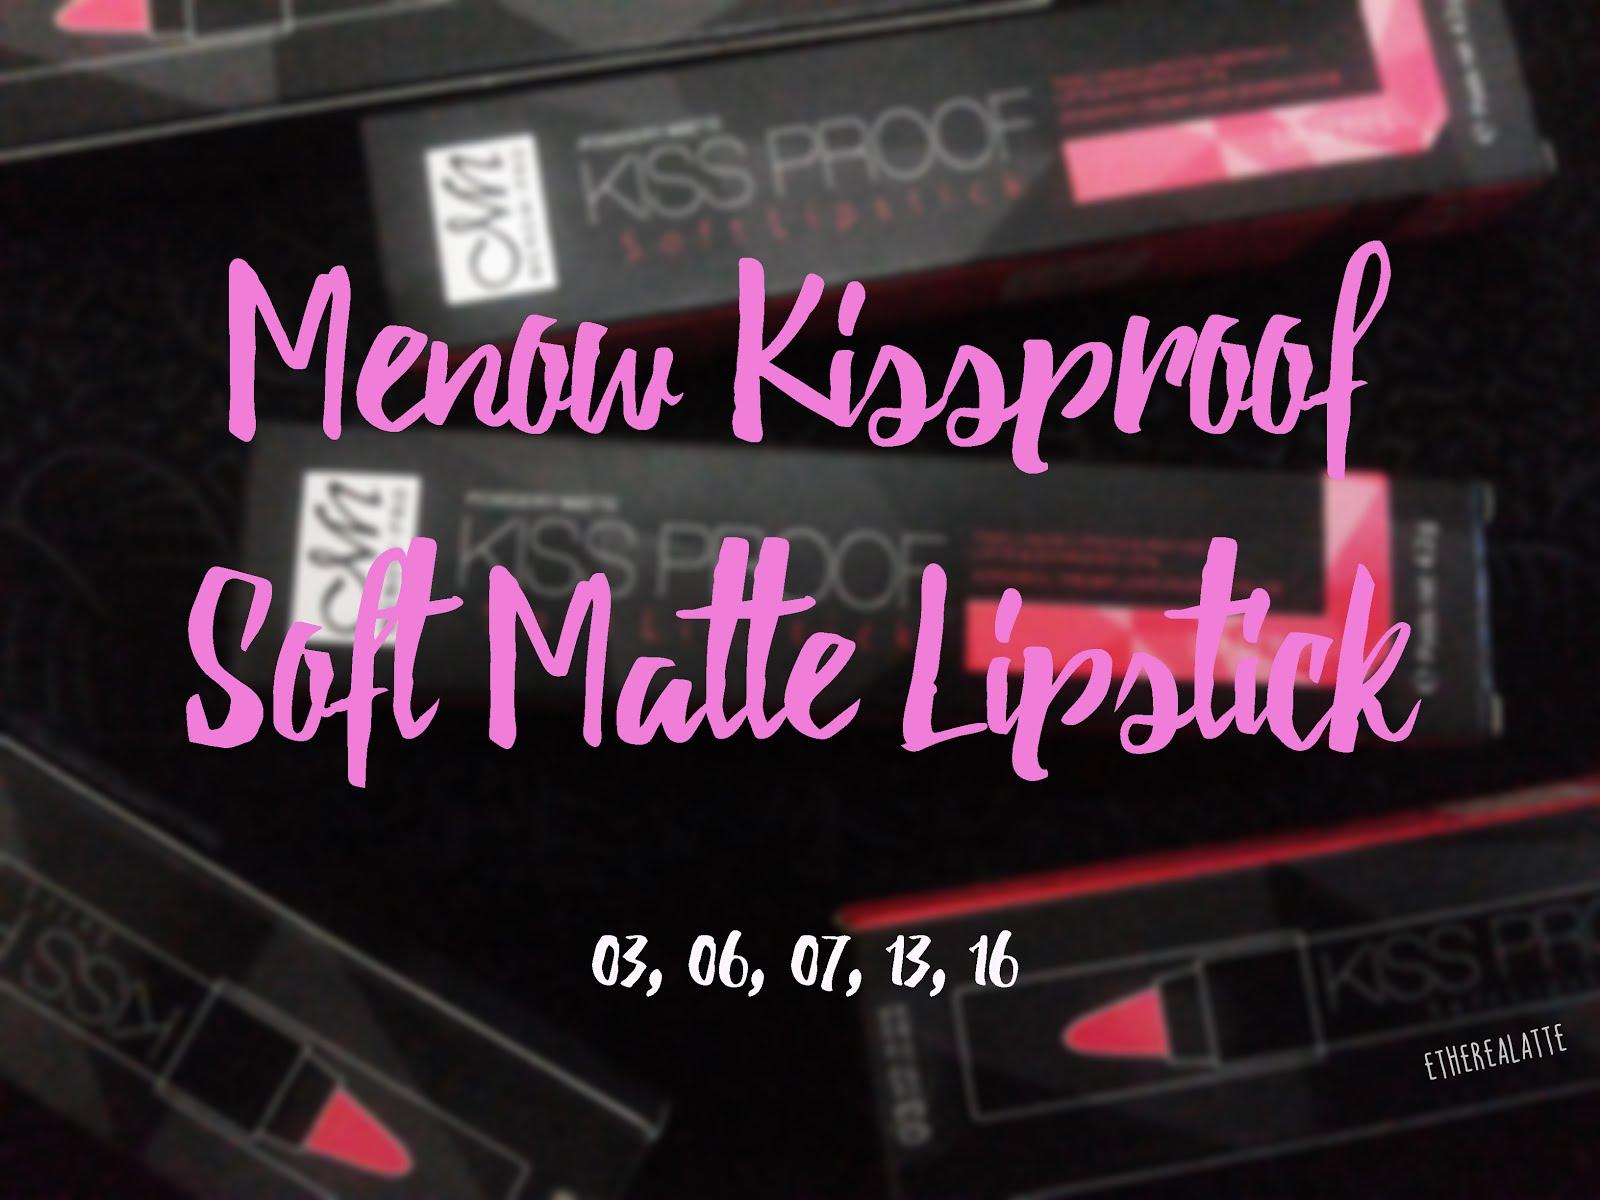 68 Review Menow Kissproof Soft Matte Lipstick Etherealatte Kiss Proof No16 Me Now Lipstik Banyak Yang Tergoda Sama Harganya Murah Dan Ketahanan Si Katanya Alias Gak Transfer Kemana Mana